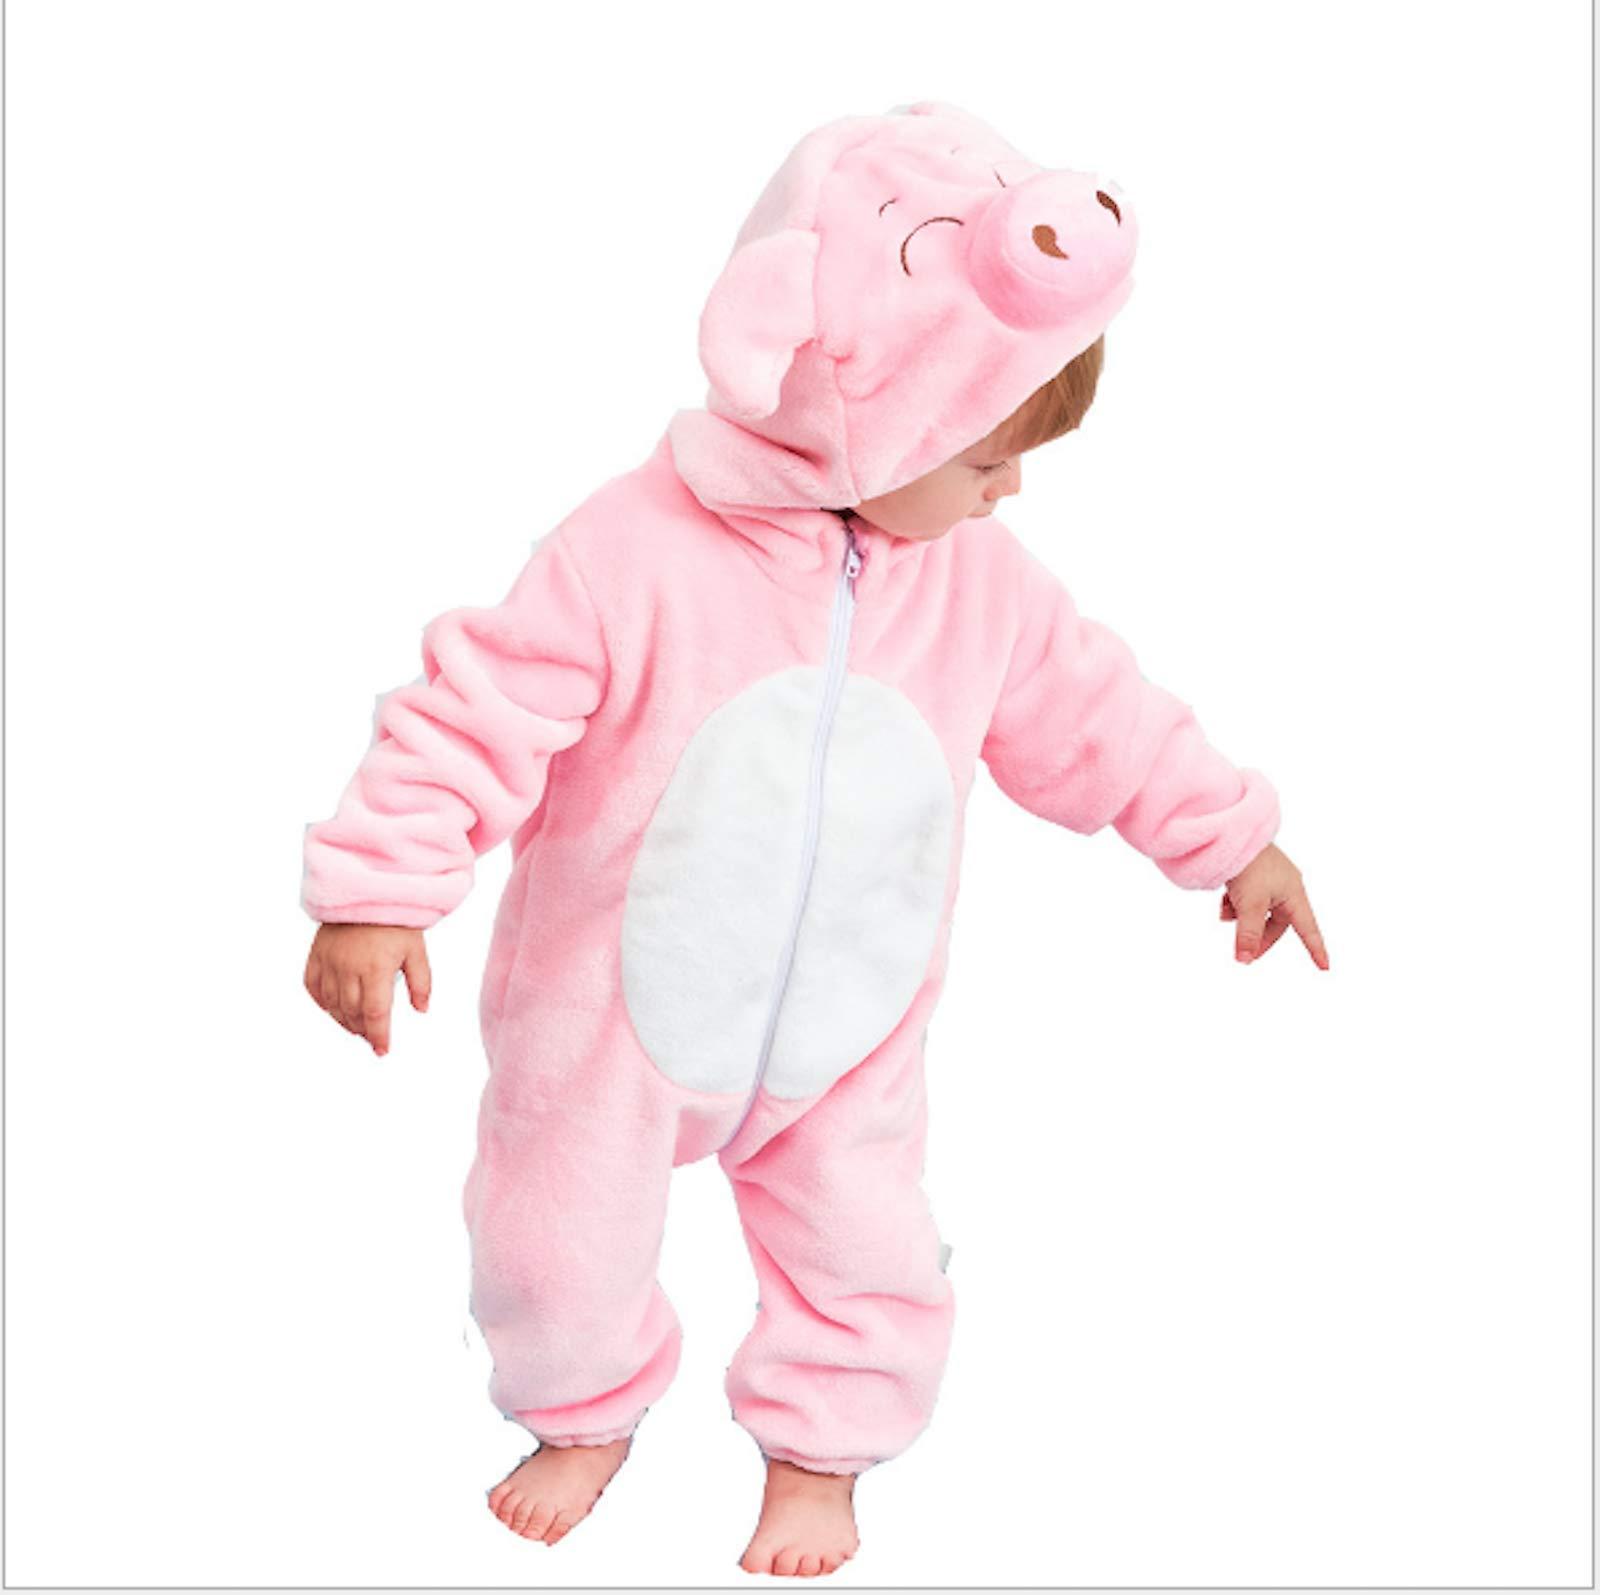 Elonglin Unisex Newborn Baby Hooded Romper Animal Flannel Snowsuit Christmas